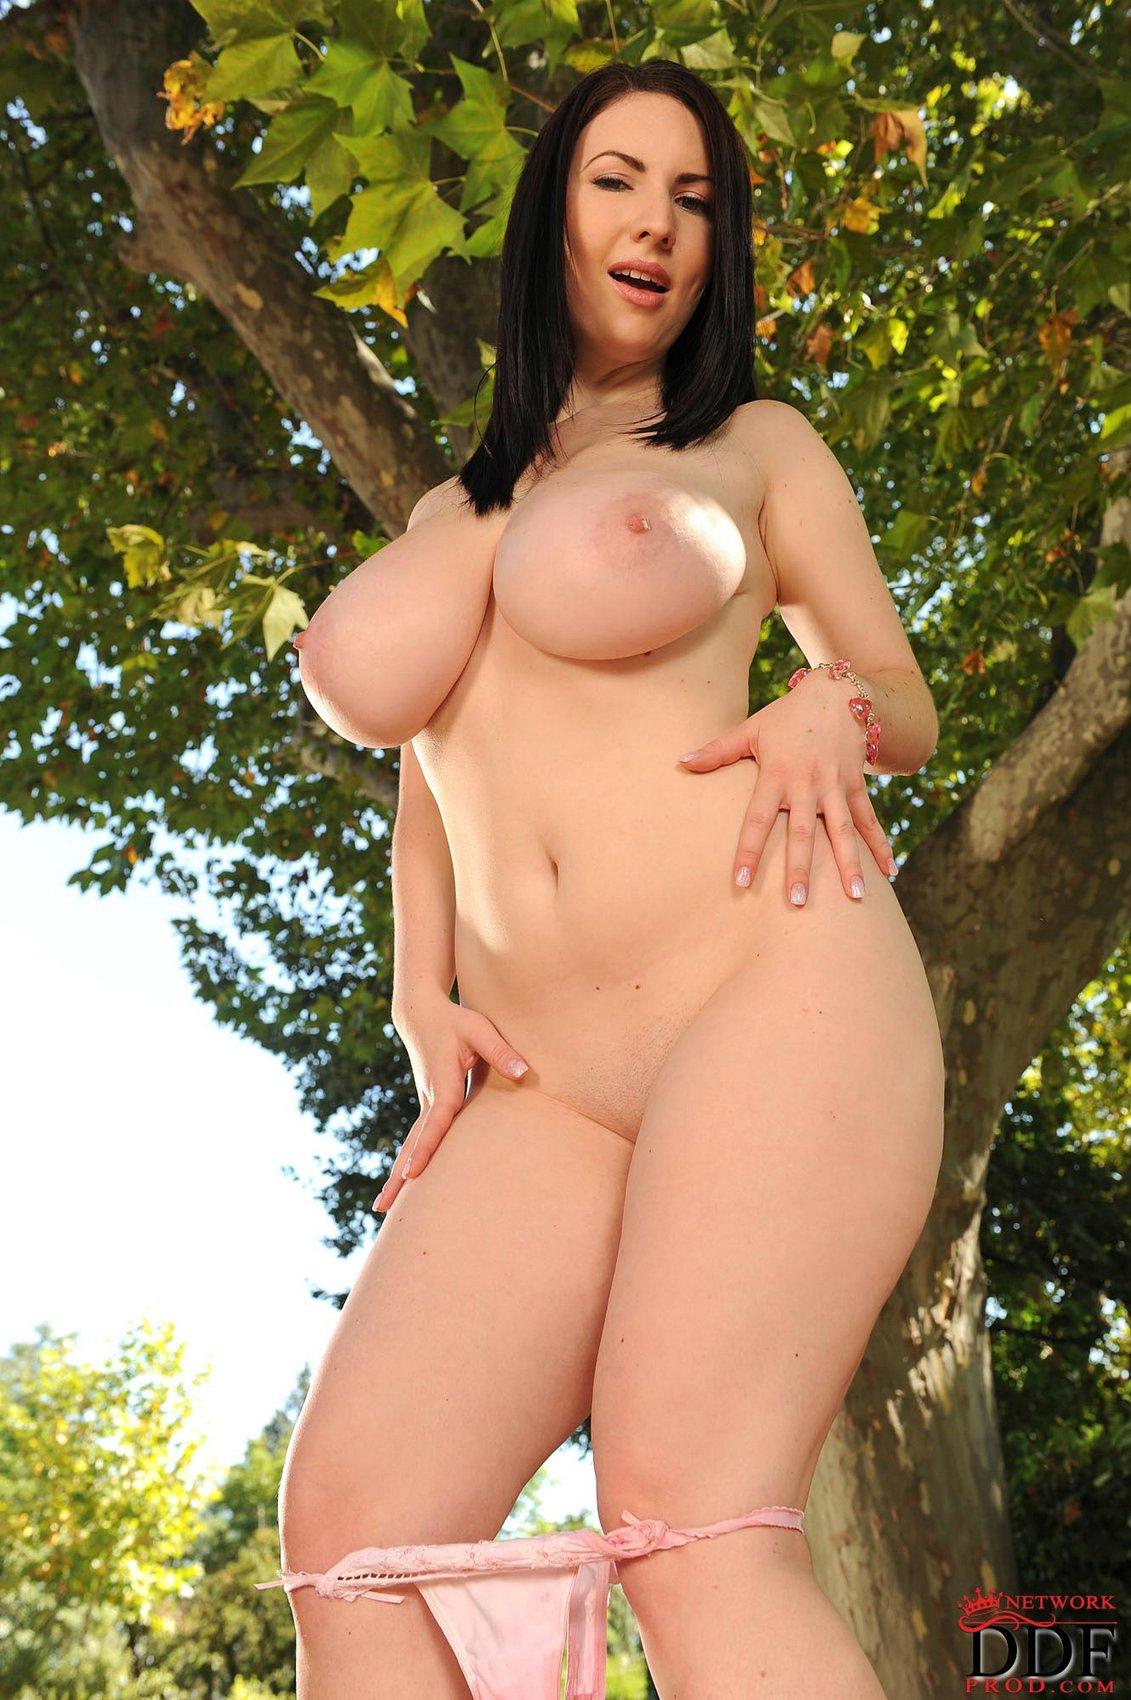 monica from survivor nude